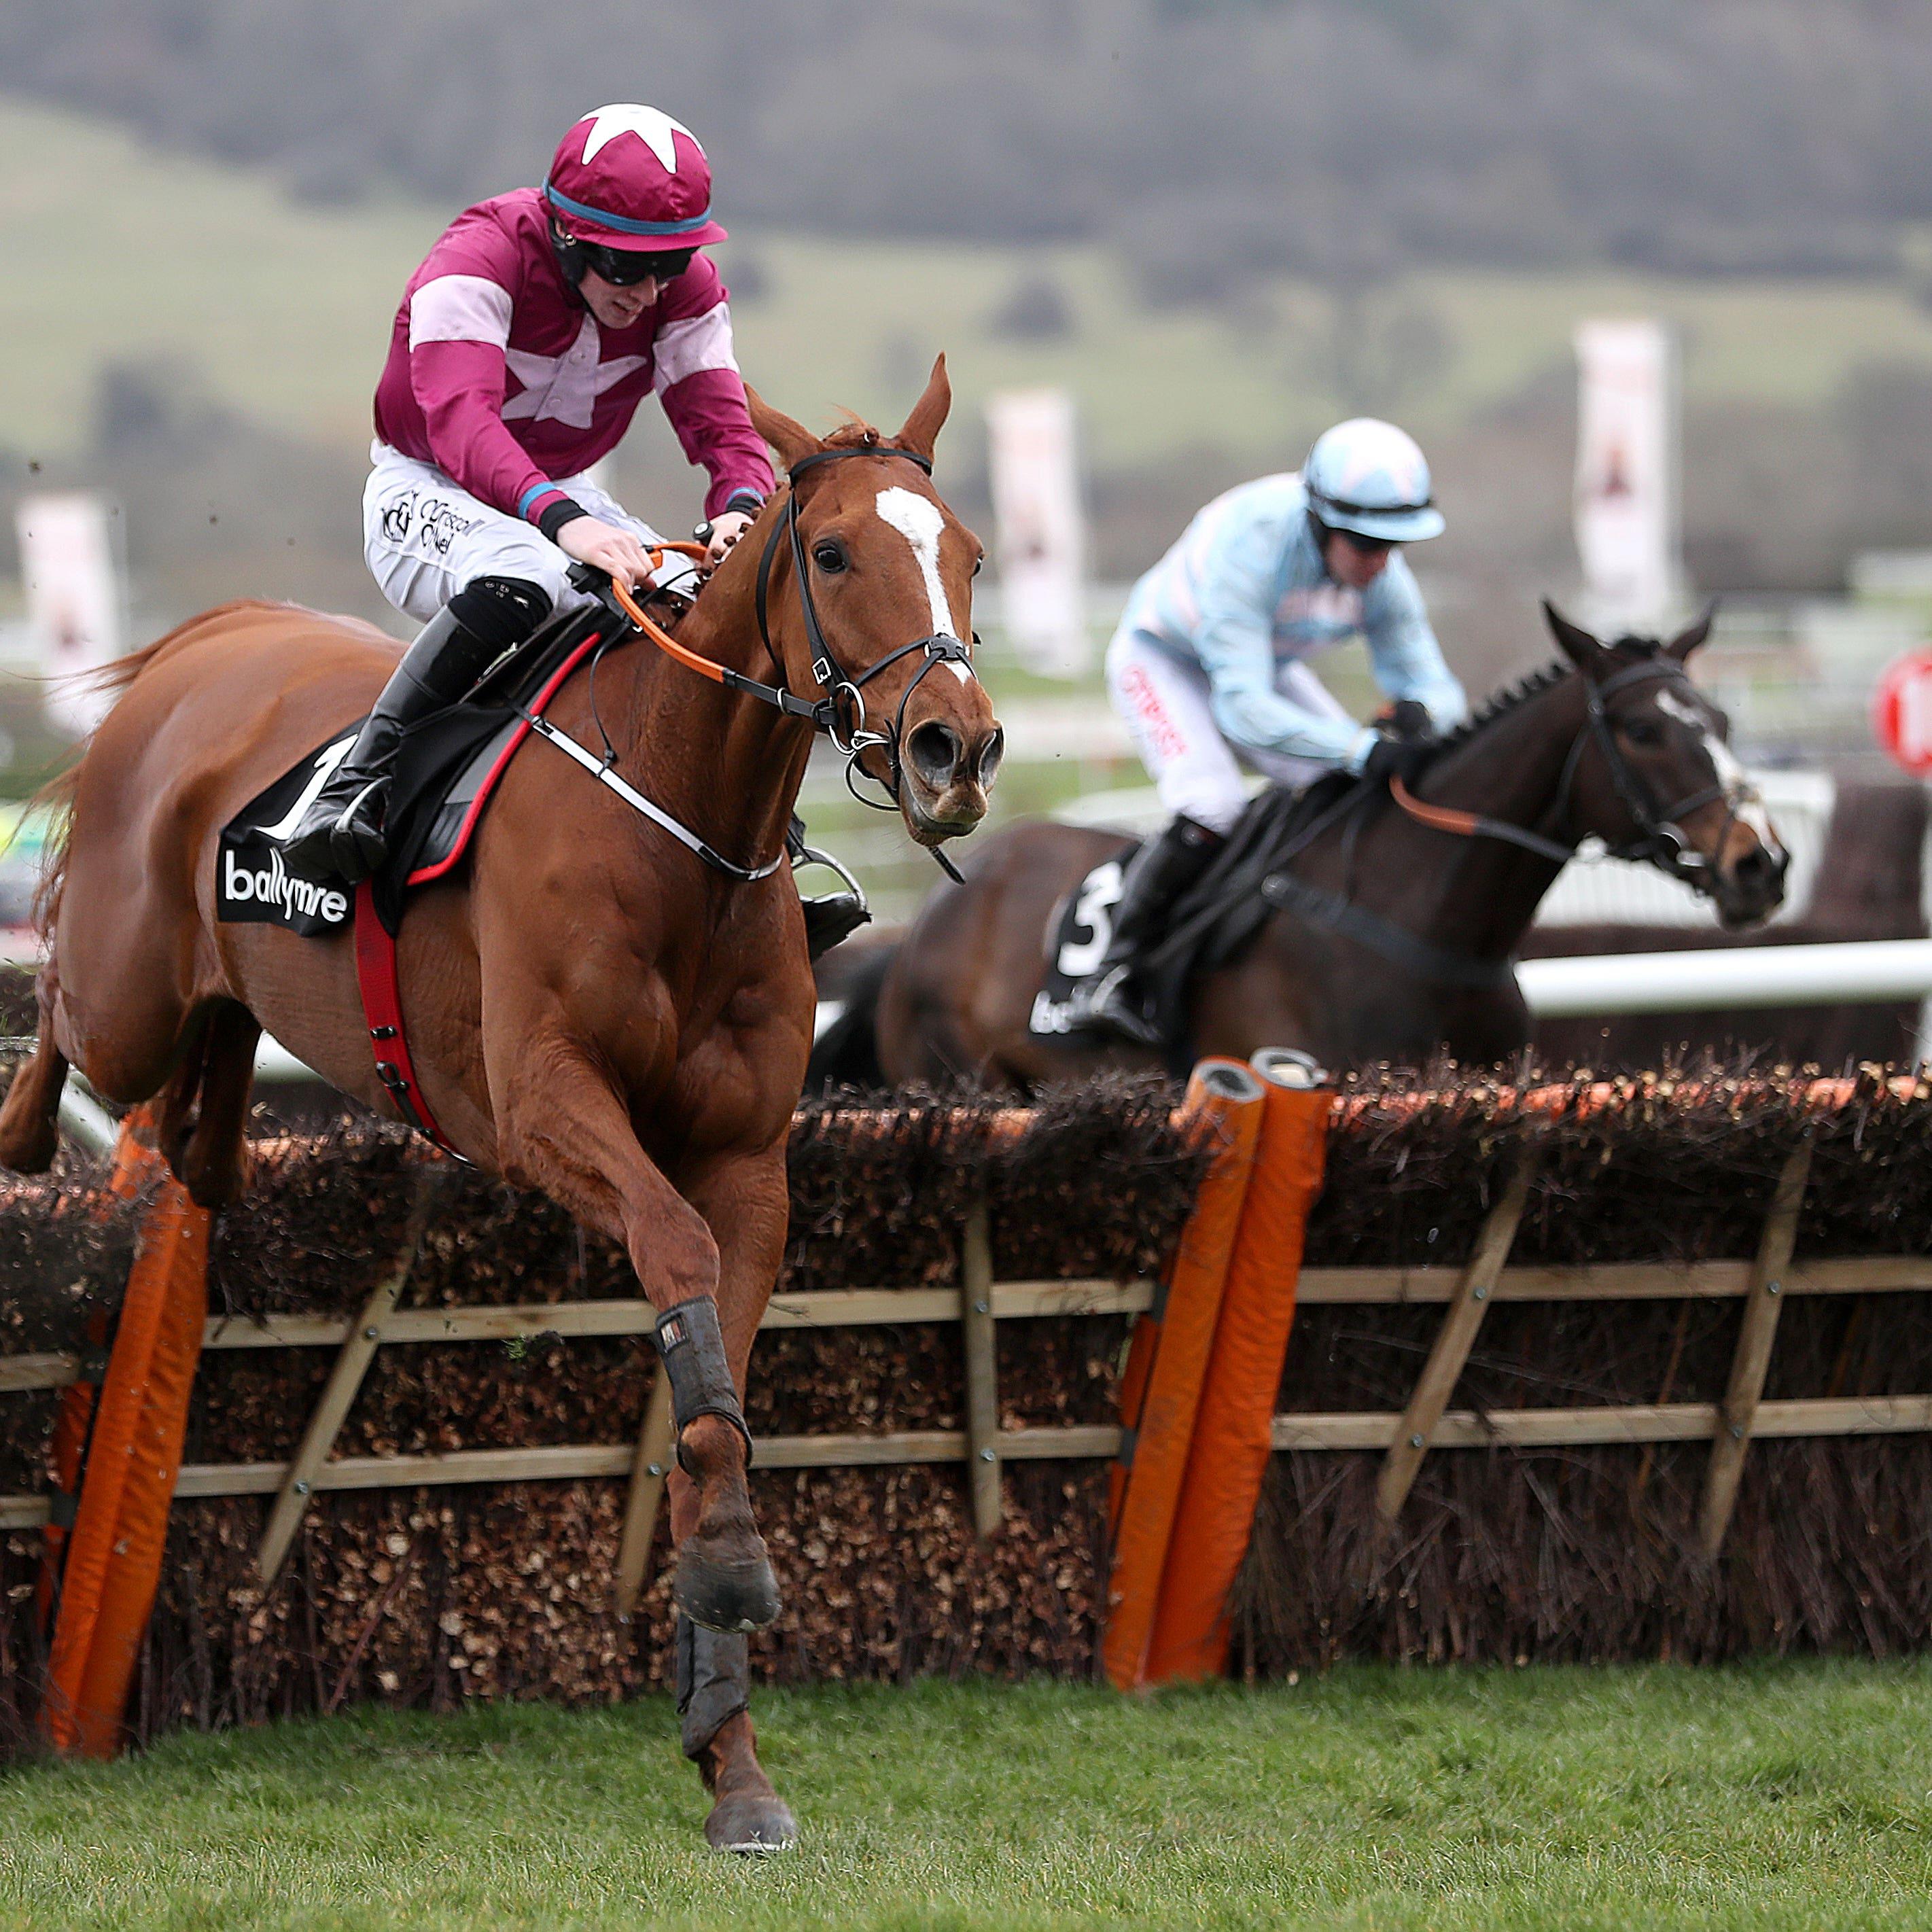 Samcro on his way to winning the Ballymore Novices' Hurdle at Cheltenham